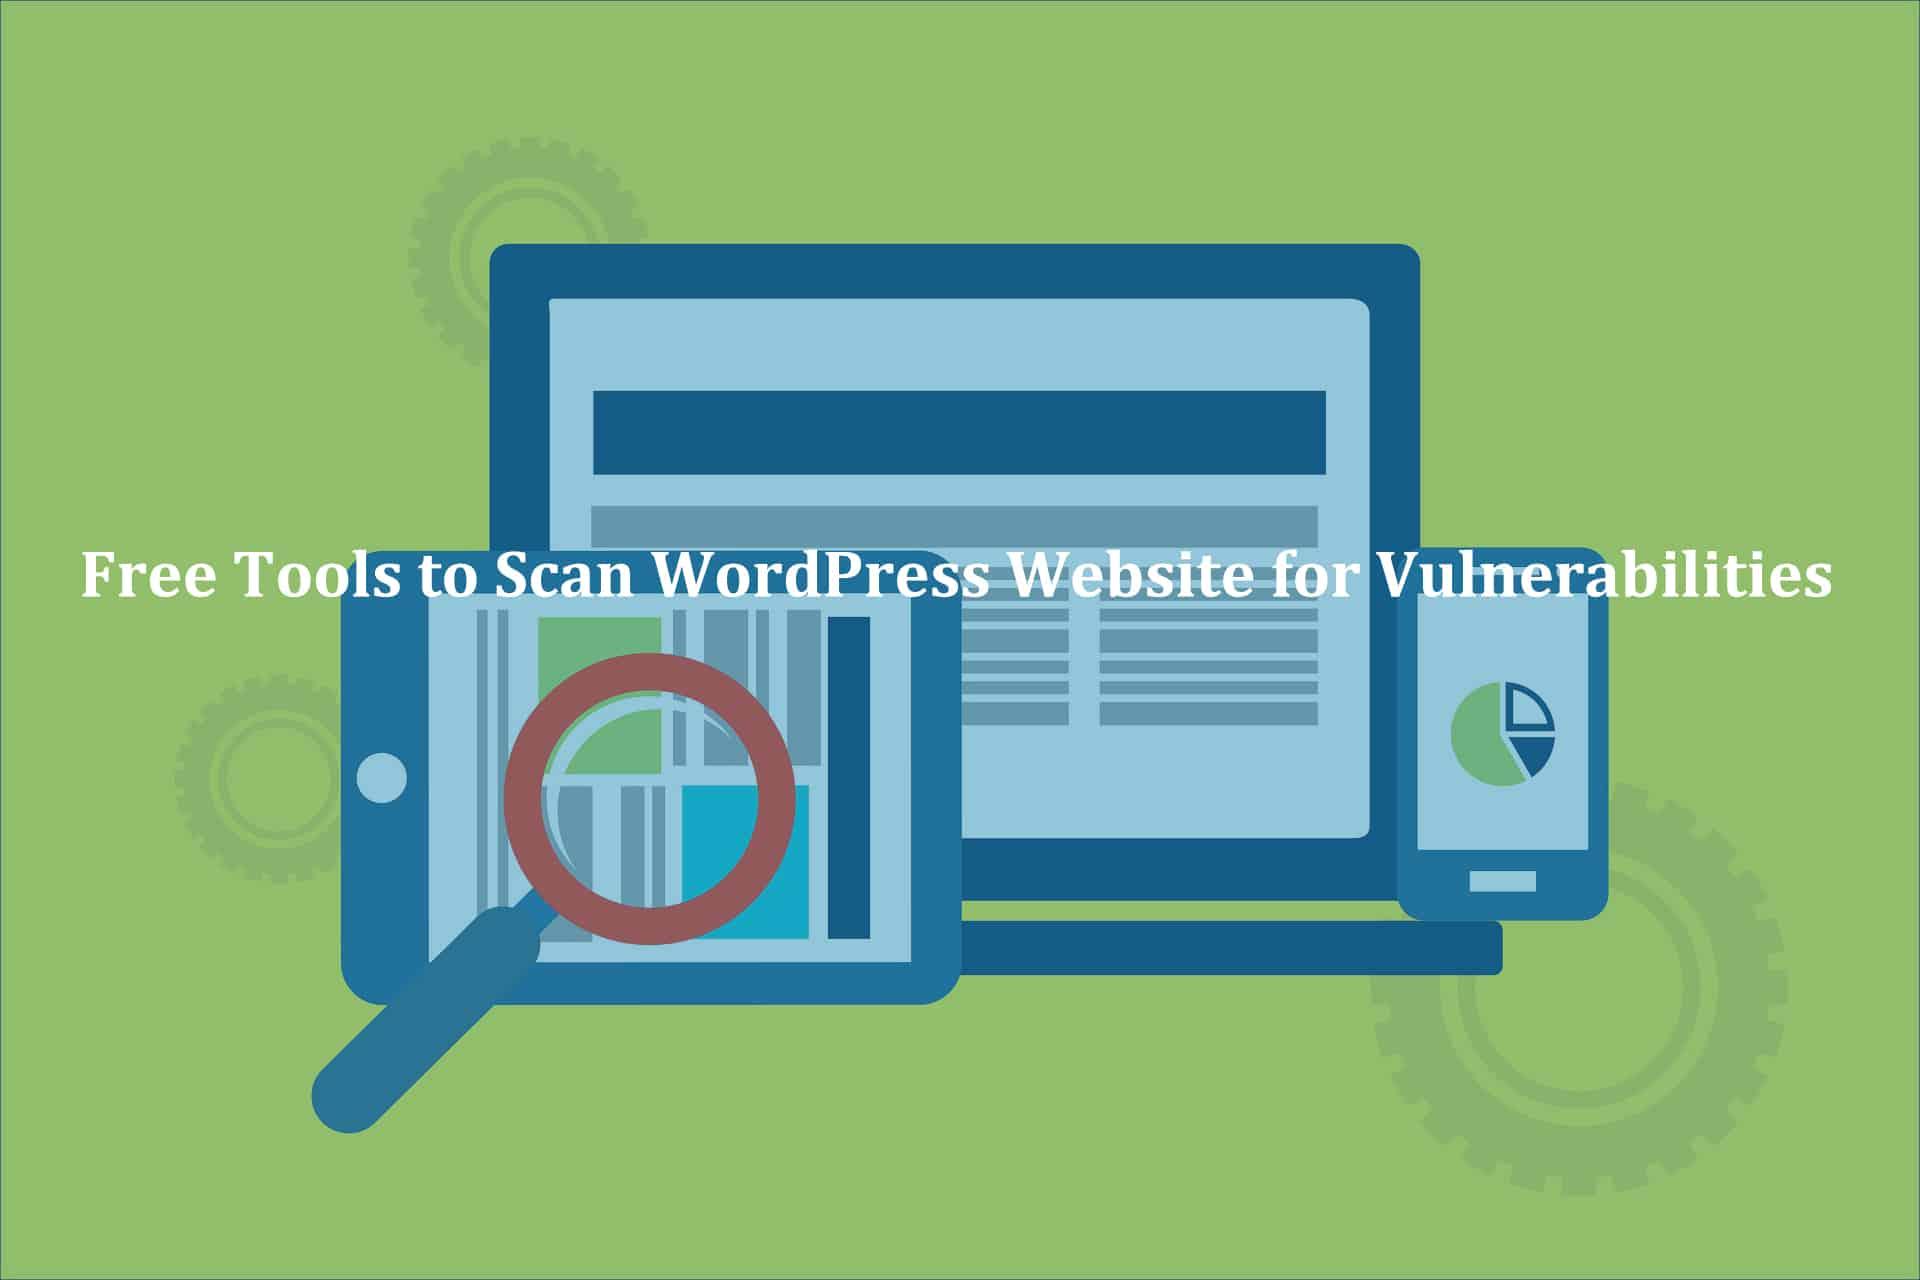 Free-Tools-to-Scan-WordPress-Website